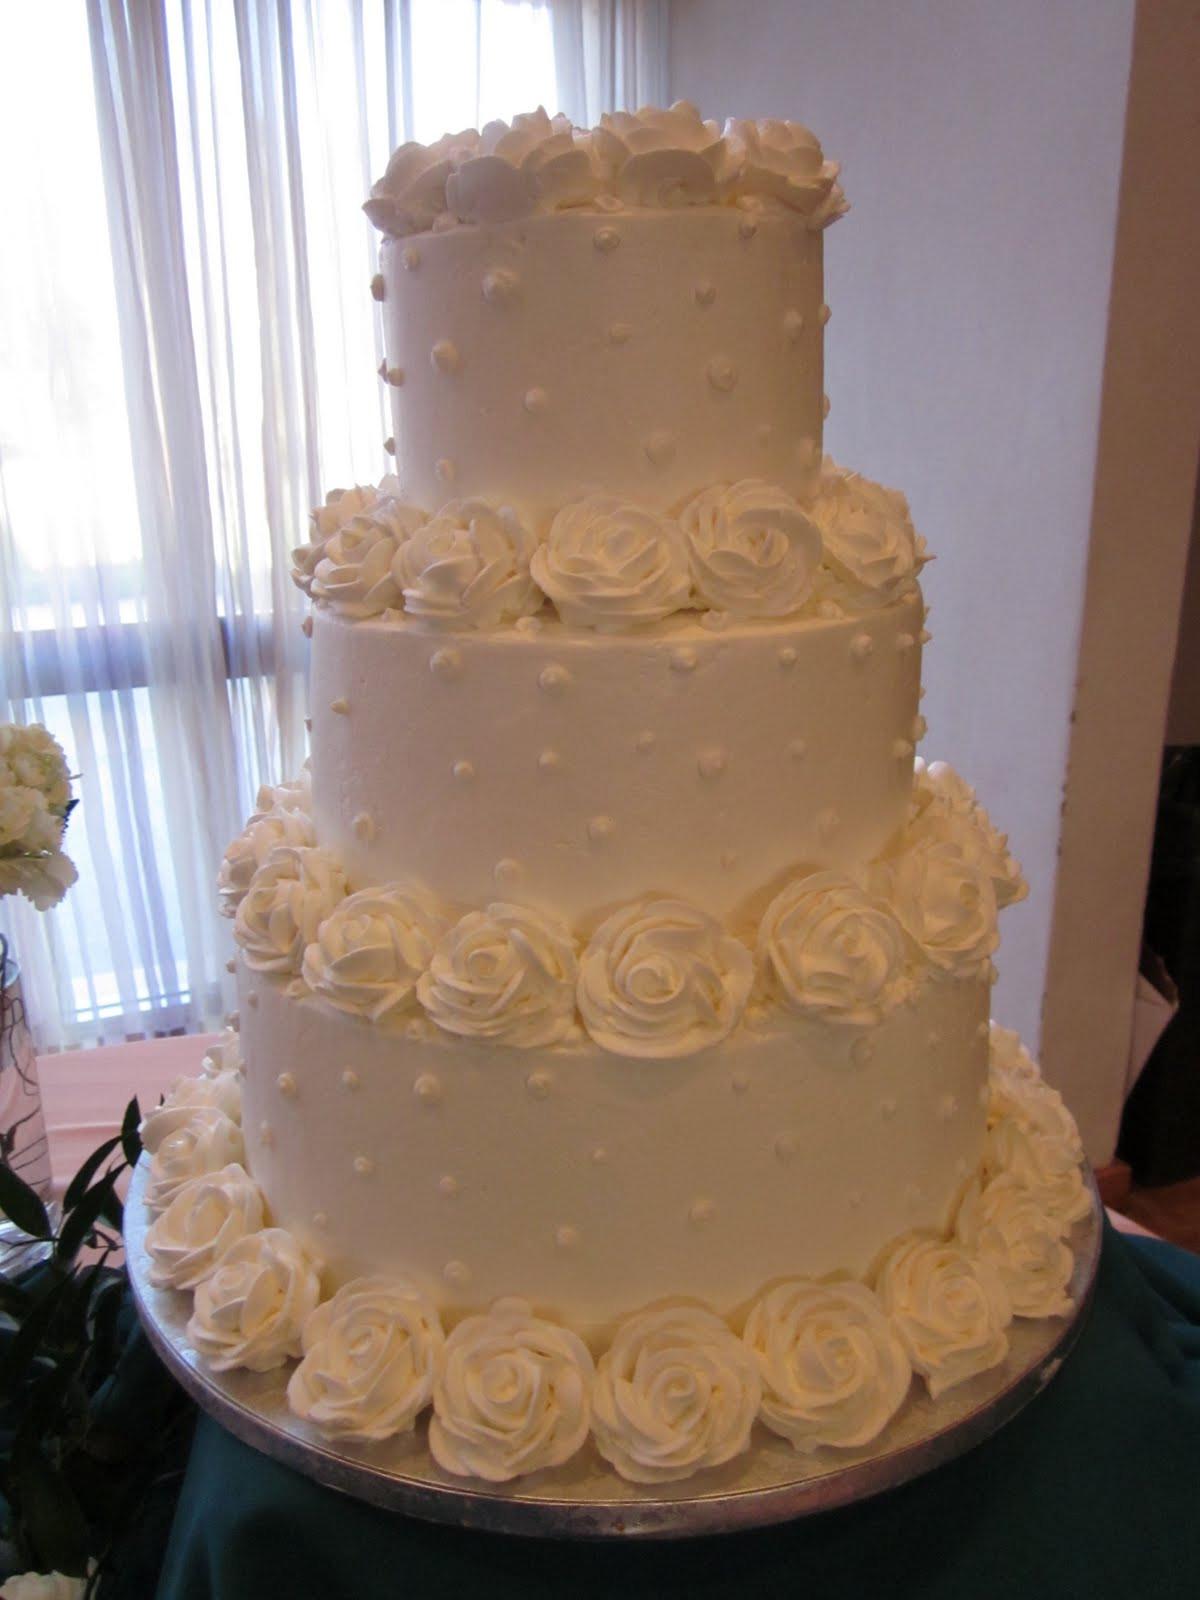 Publix Wedding Cakes  10 tips on how to choose your Publix wedding cakes idea